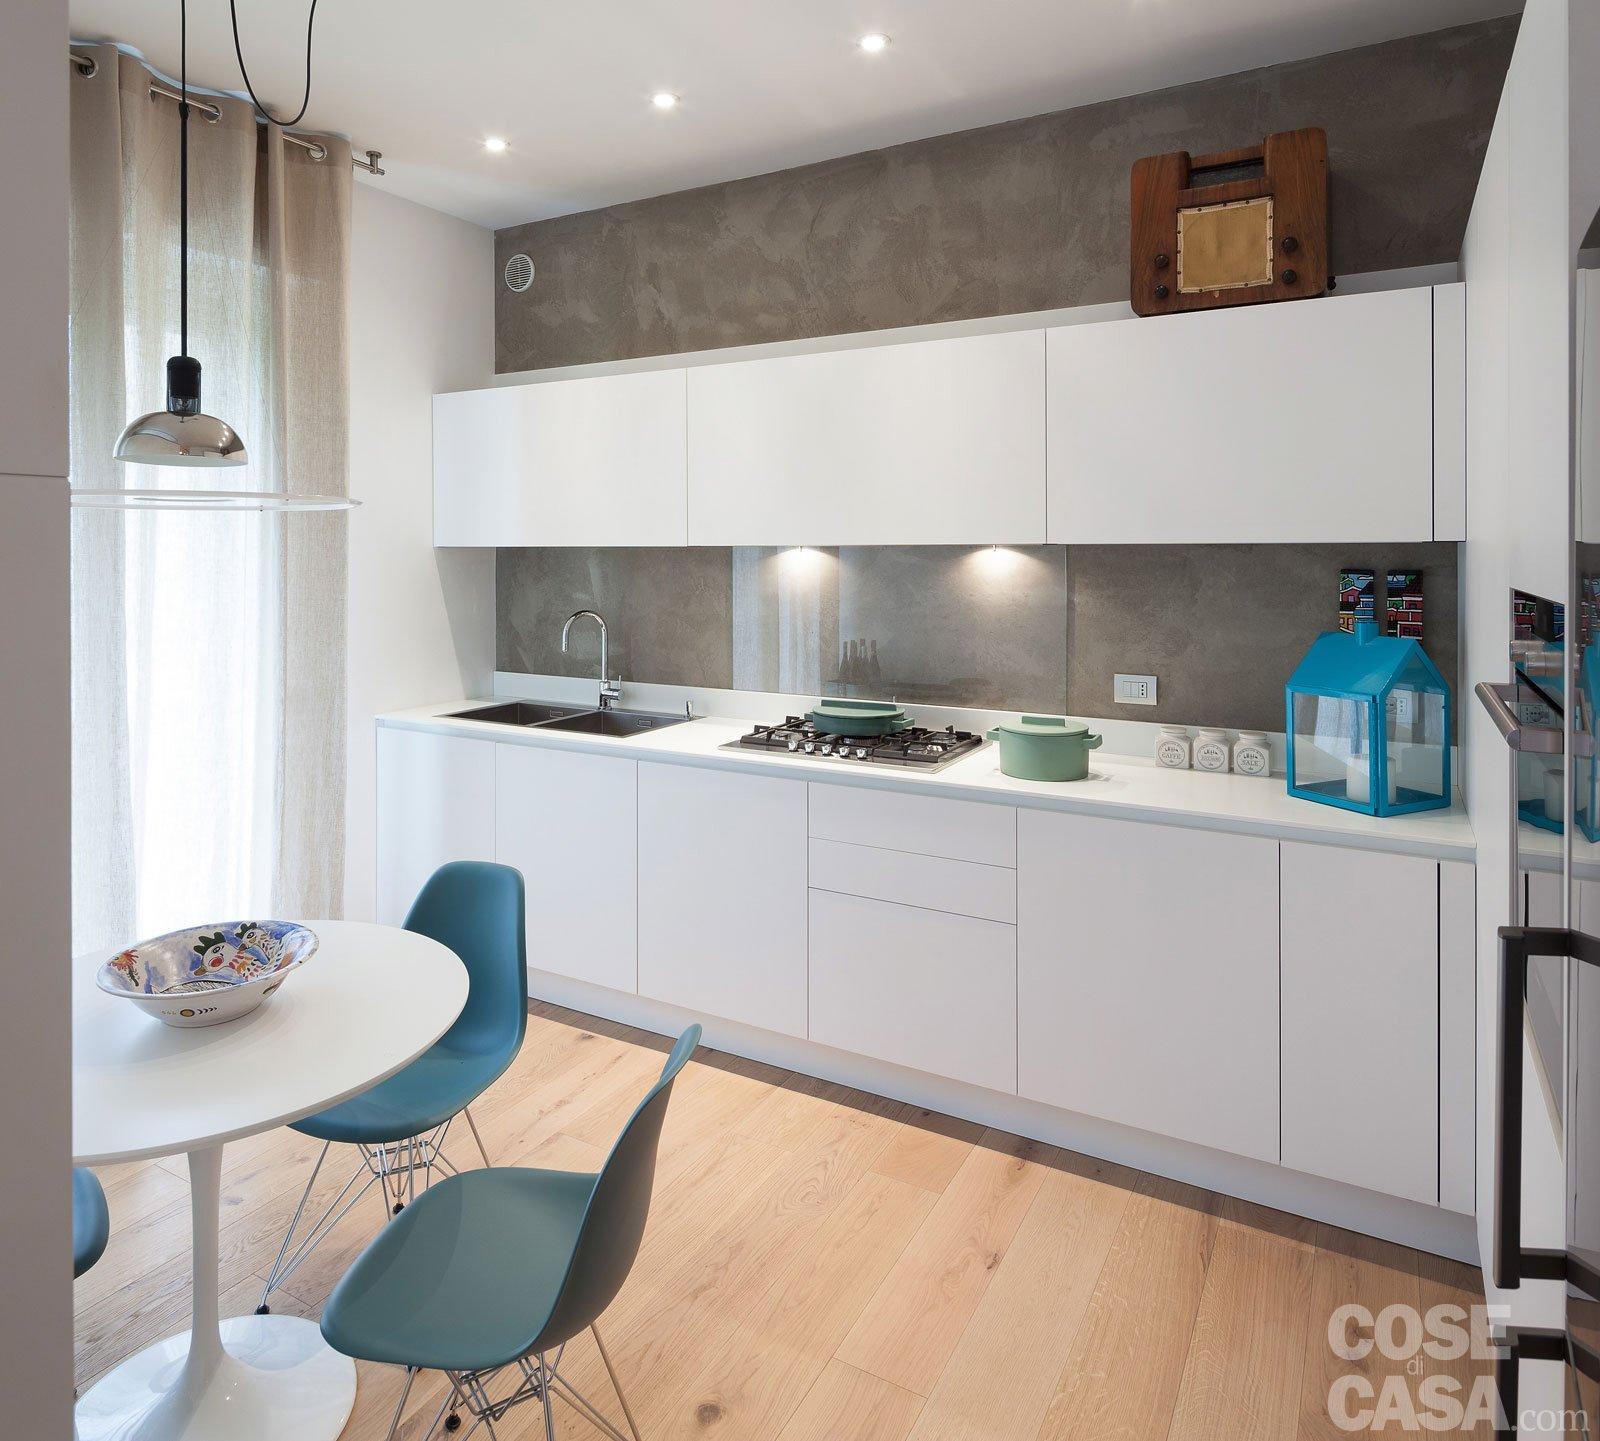 Stunning Cucina Ambiente Unico Pictures - Home Interior Ideas ...